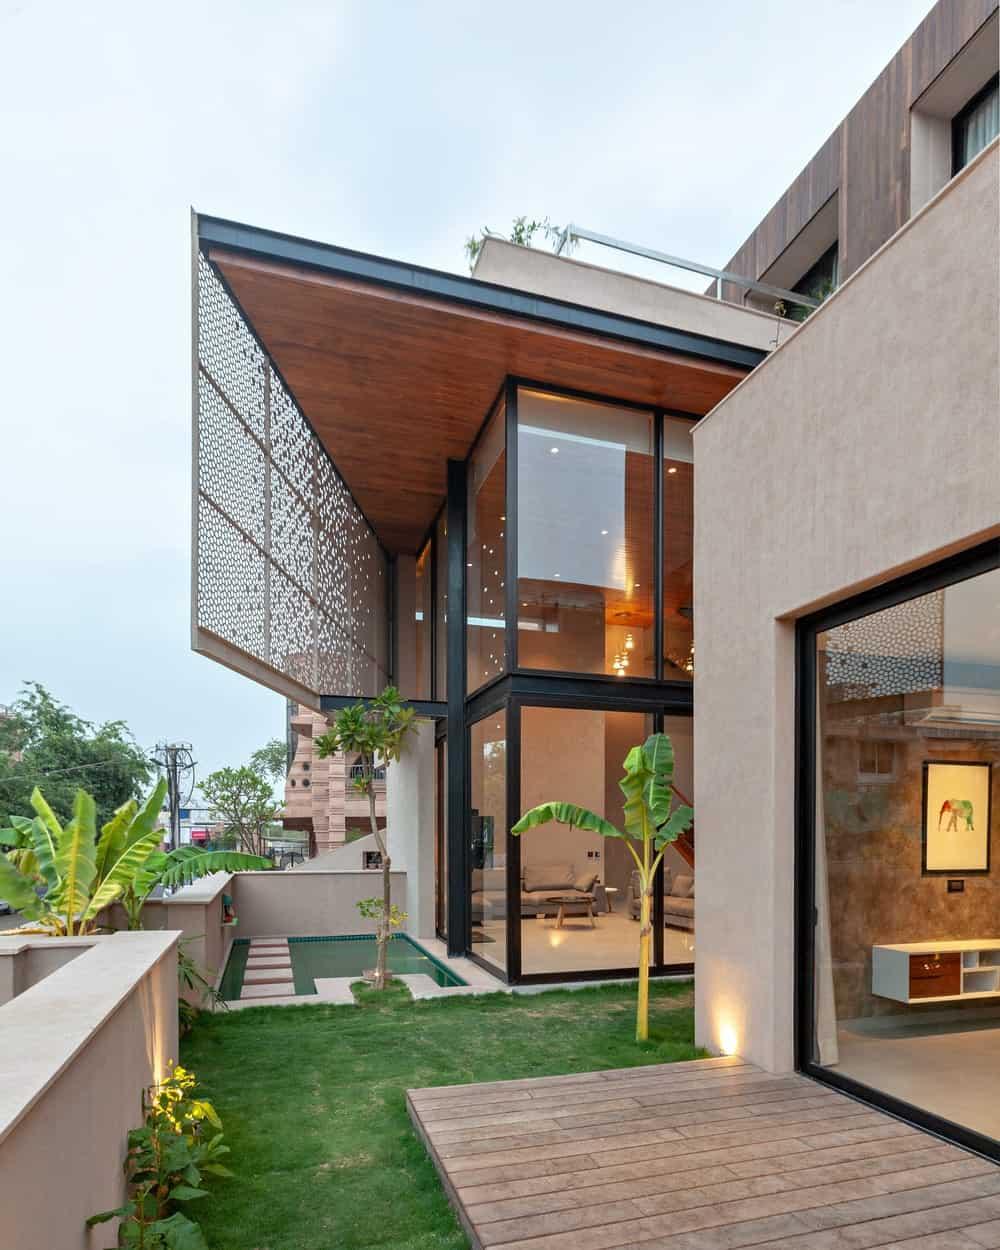 Open patios of the Chhavi House (Oasis in the Thar Desert) designed by Abraham John Architects.